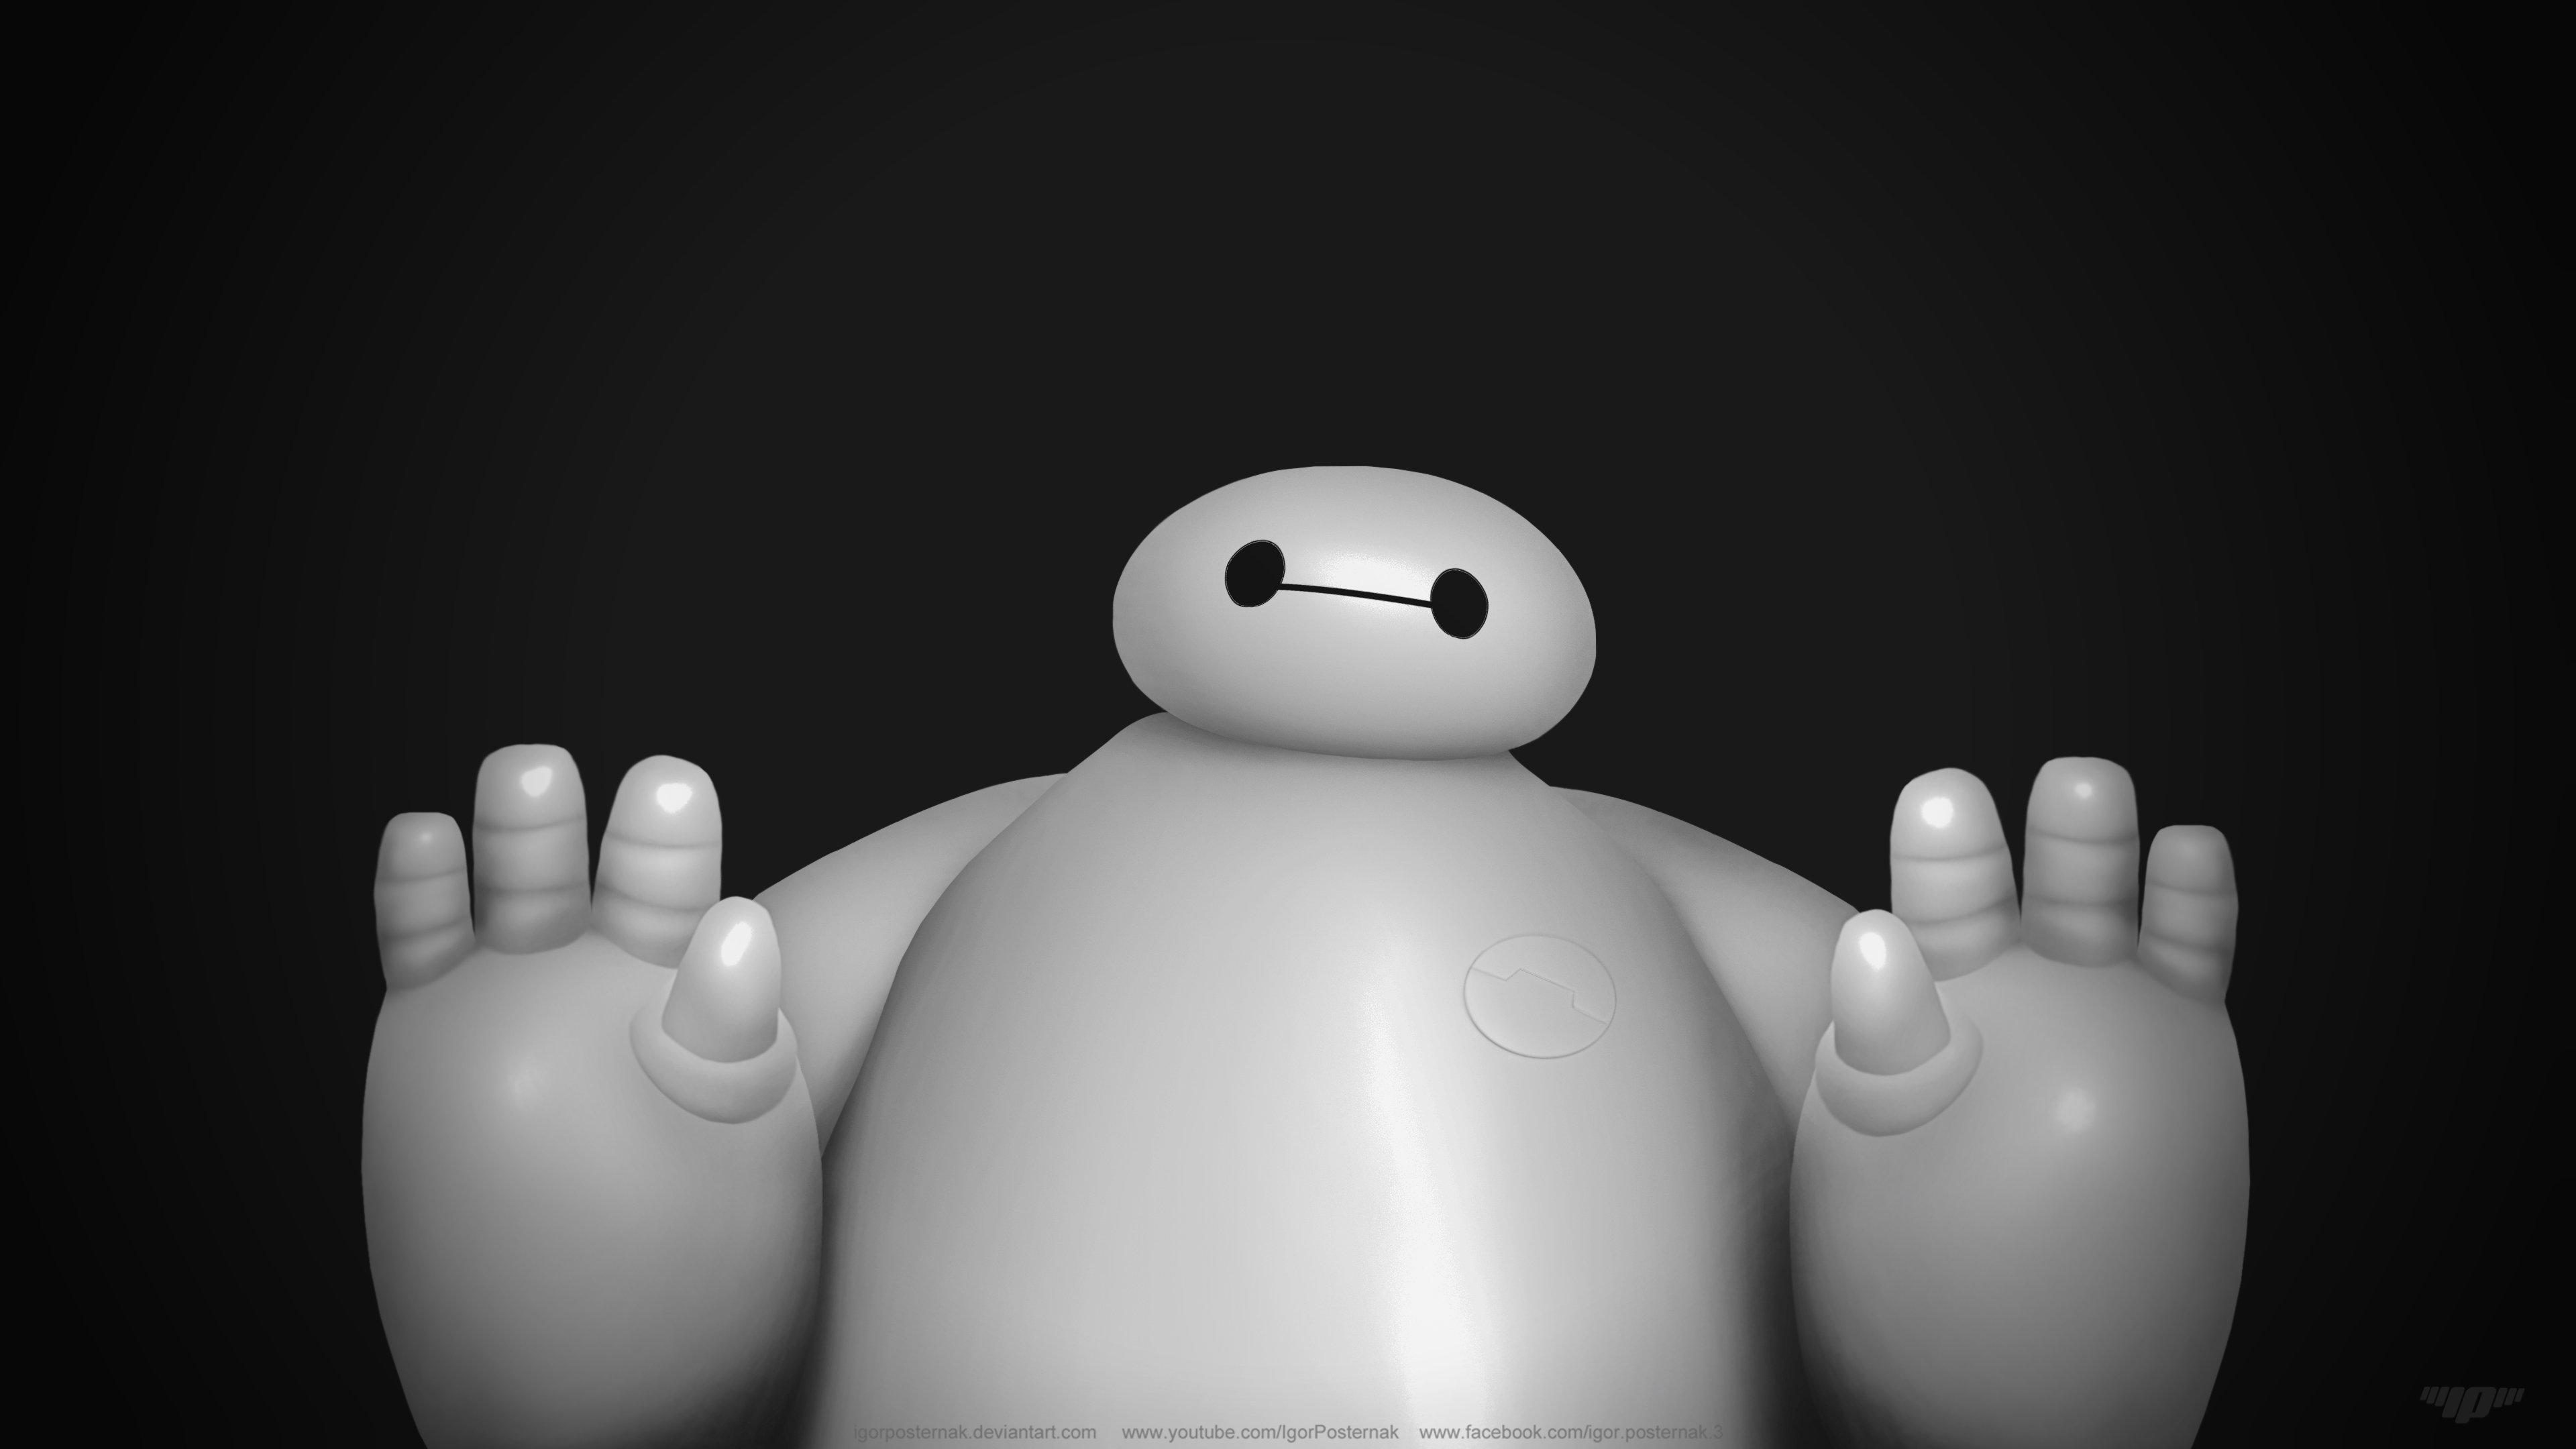 big hero 6 baymax cartoon cute robot funny wallpaper | 3840x2160